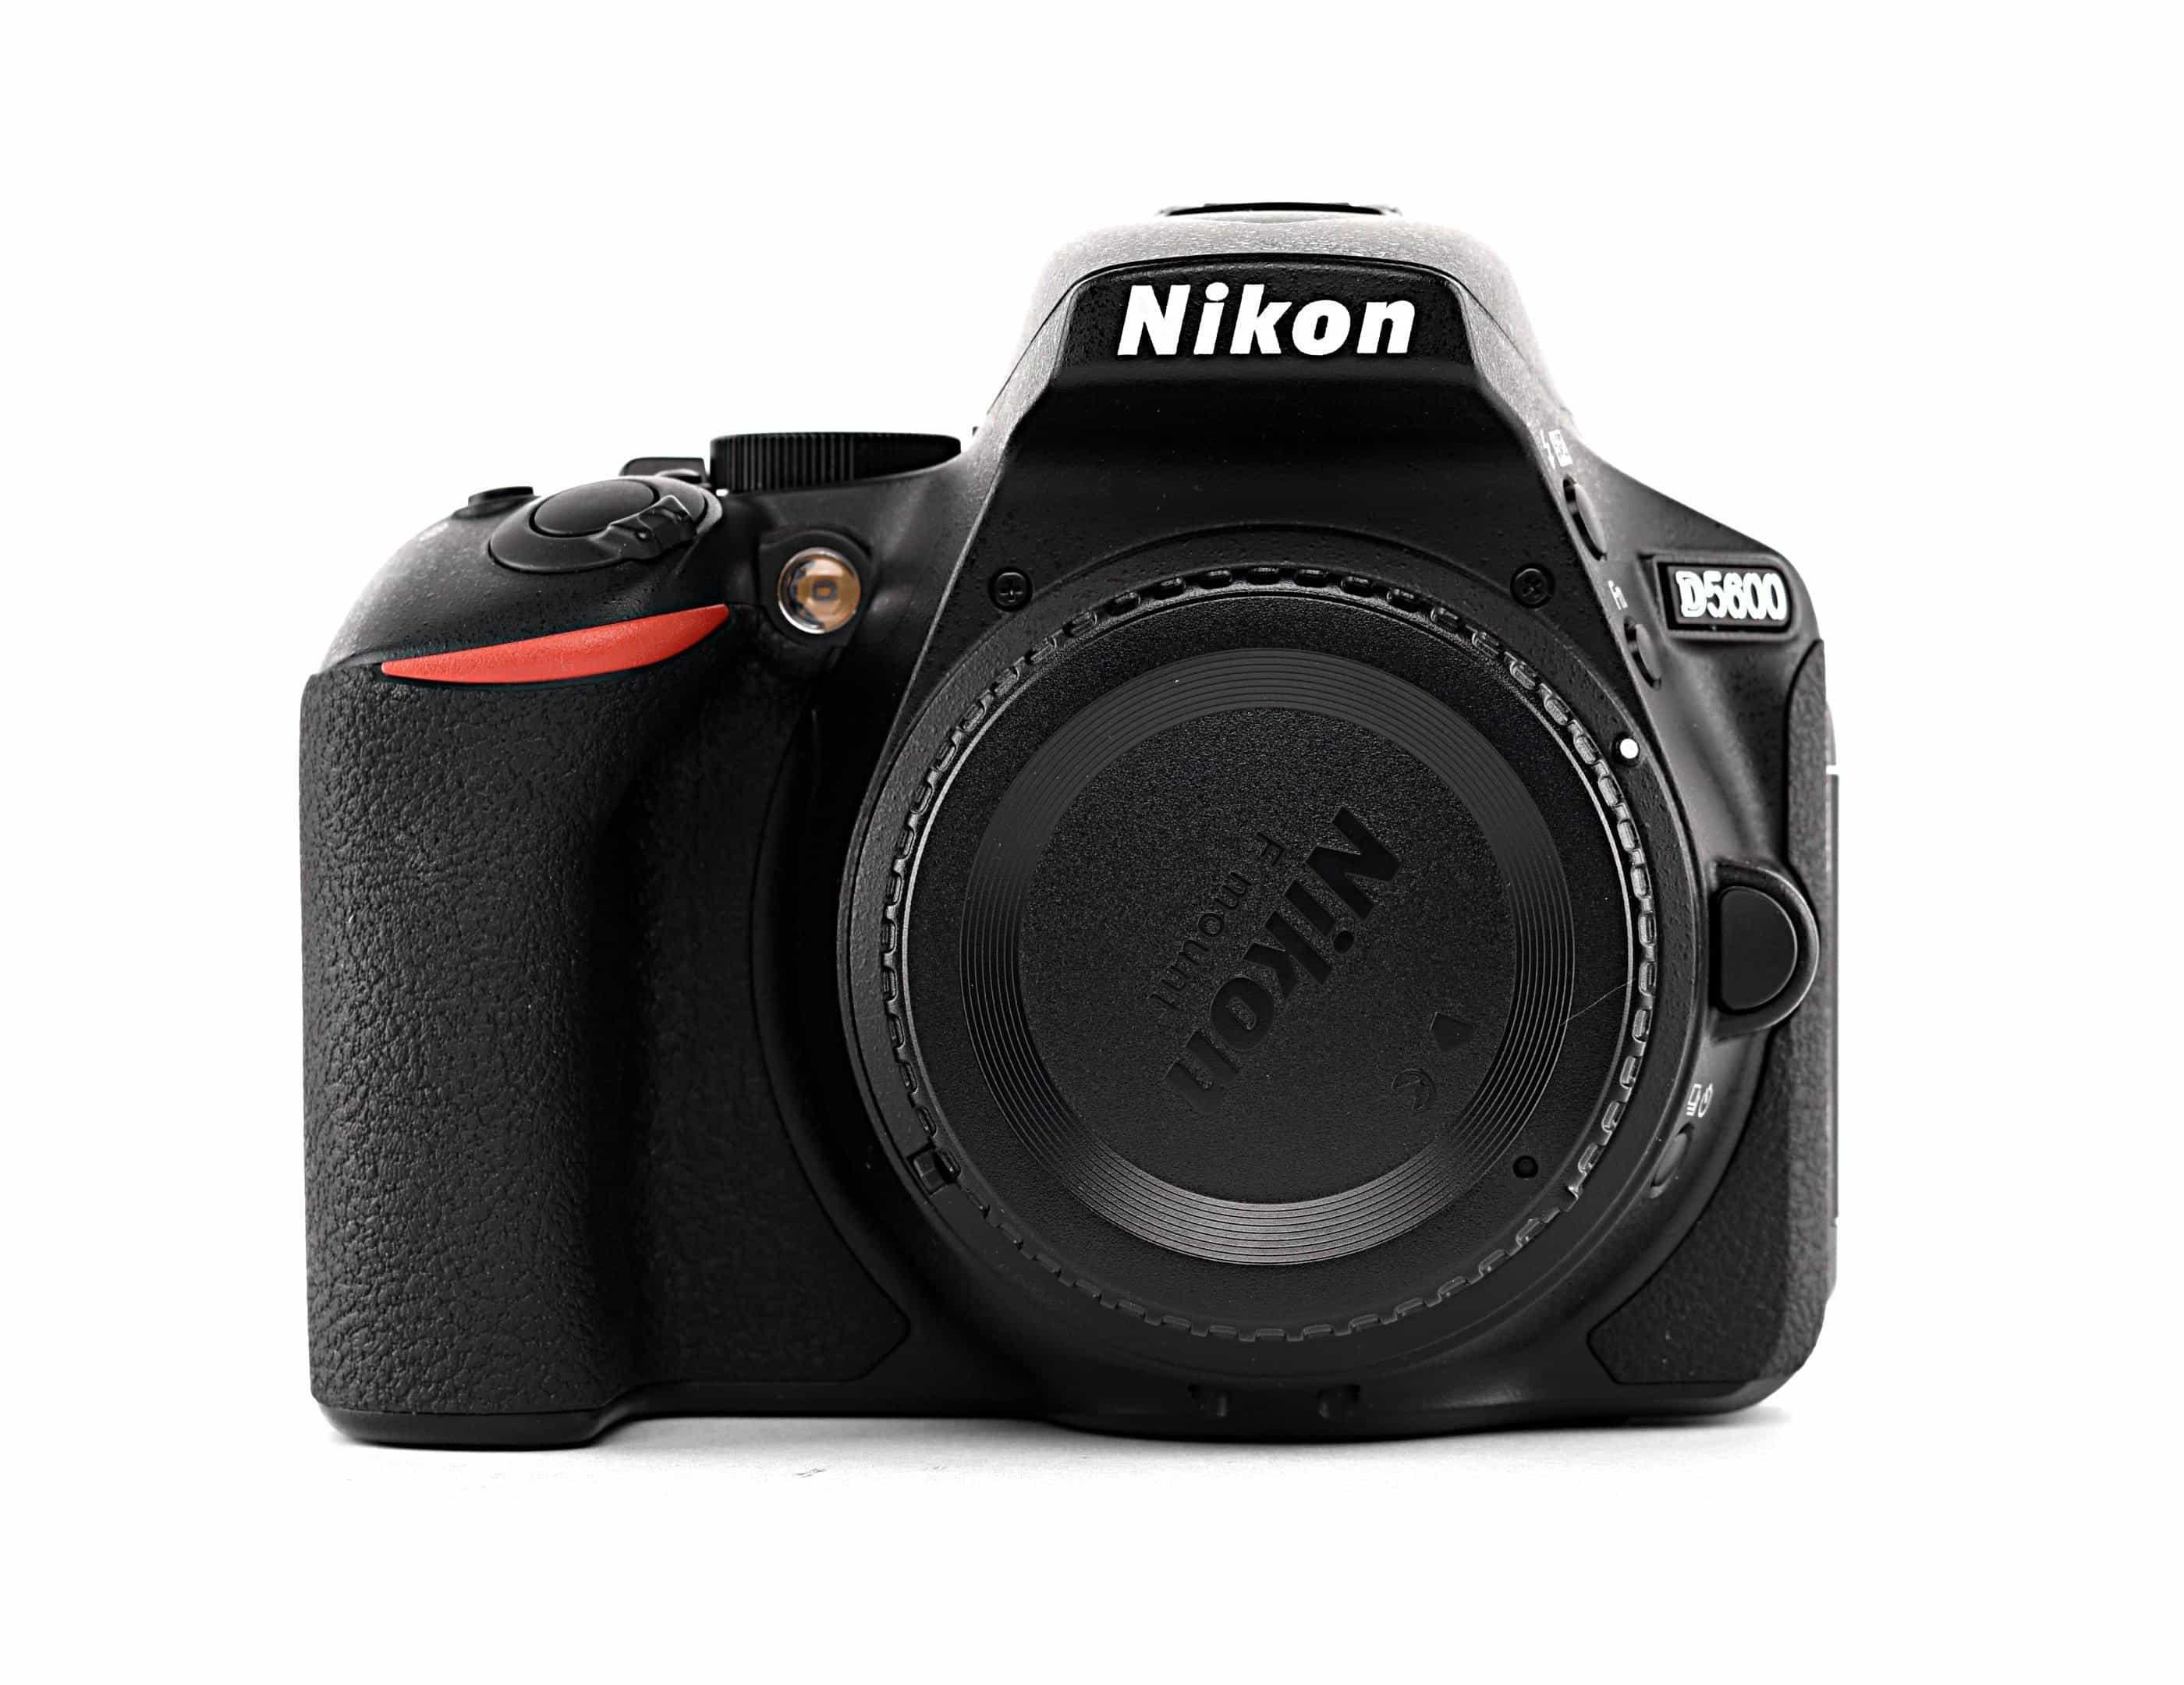 Compare NIKON D5600     Black, with 18 55mm VR  Lens at KSA Price